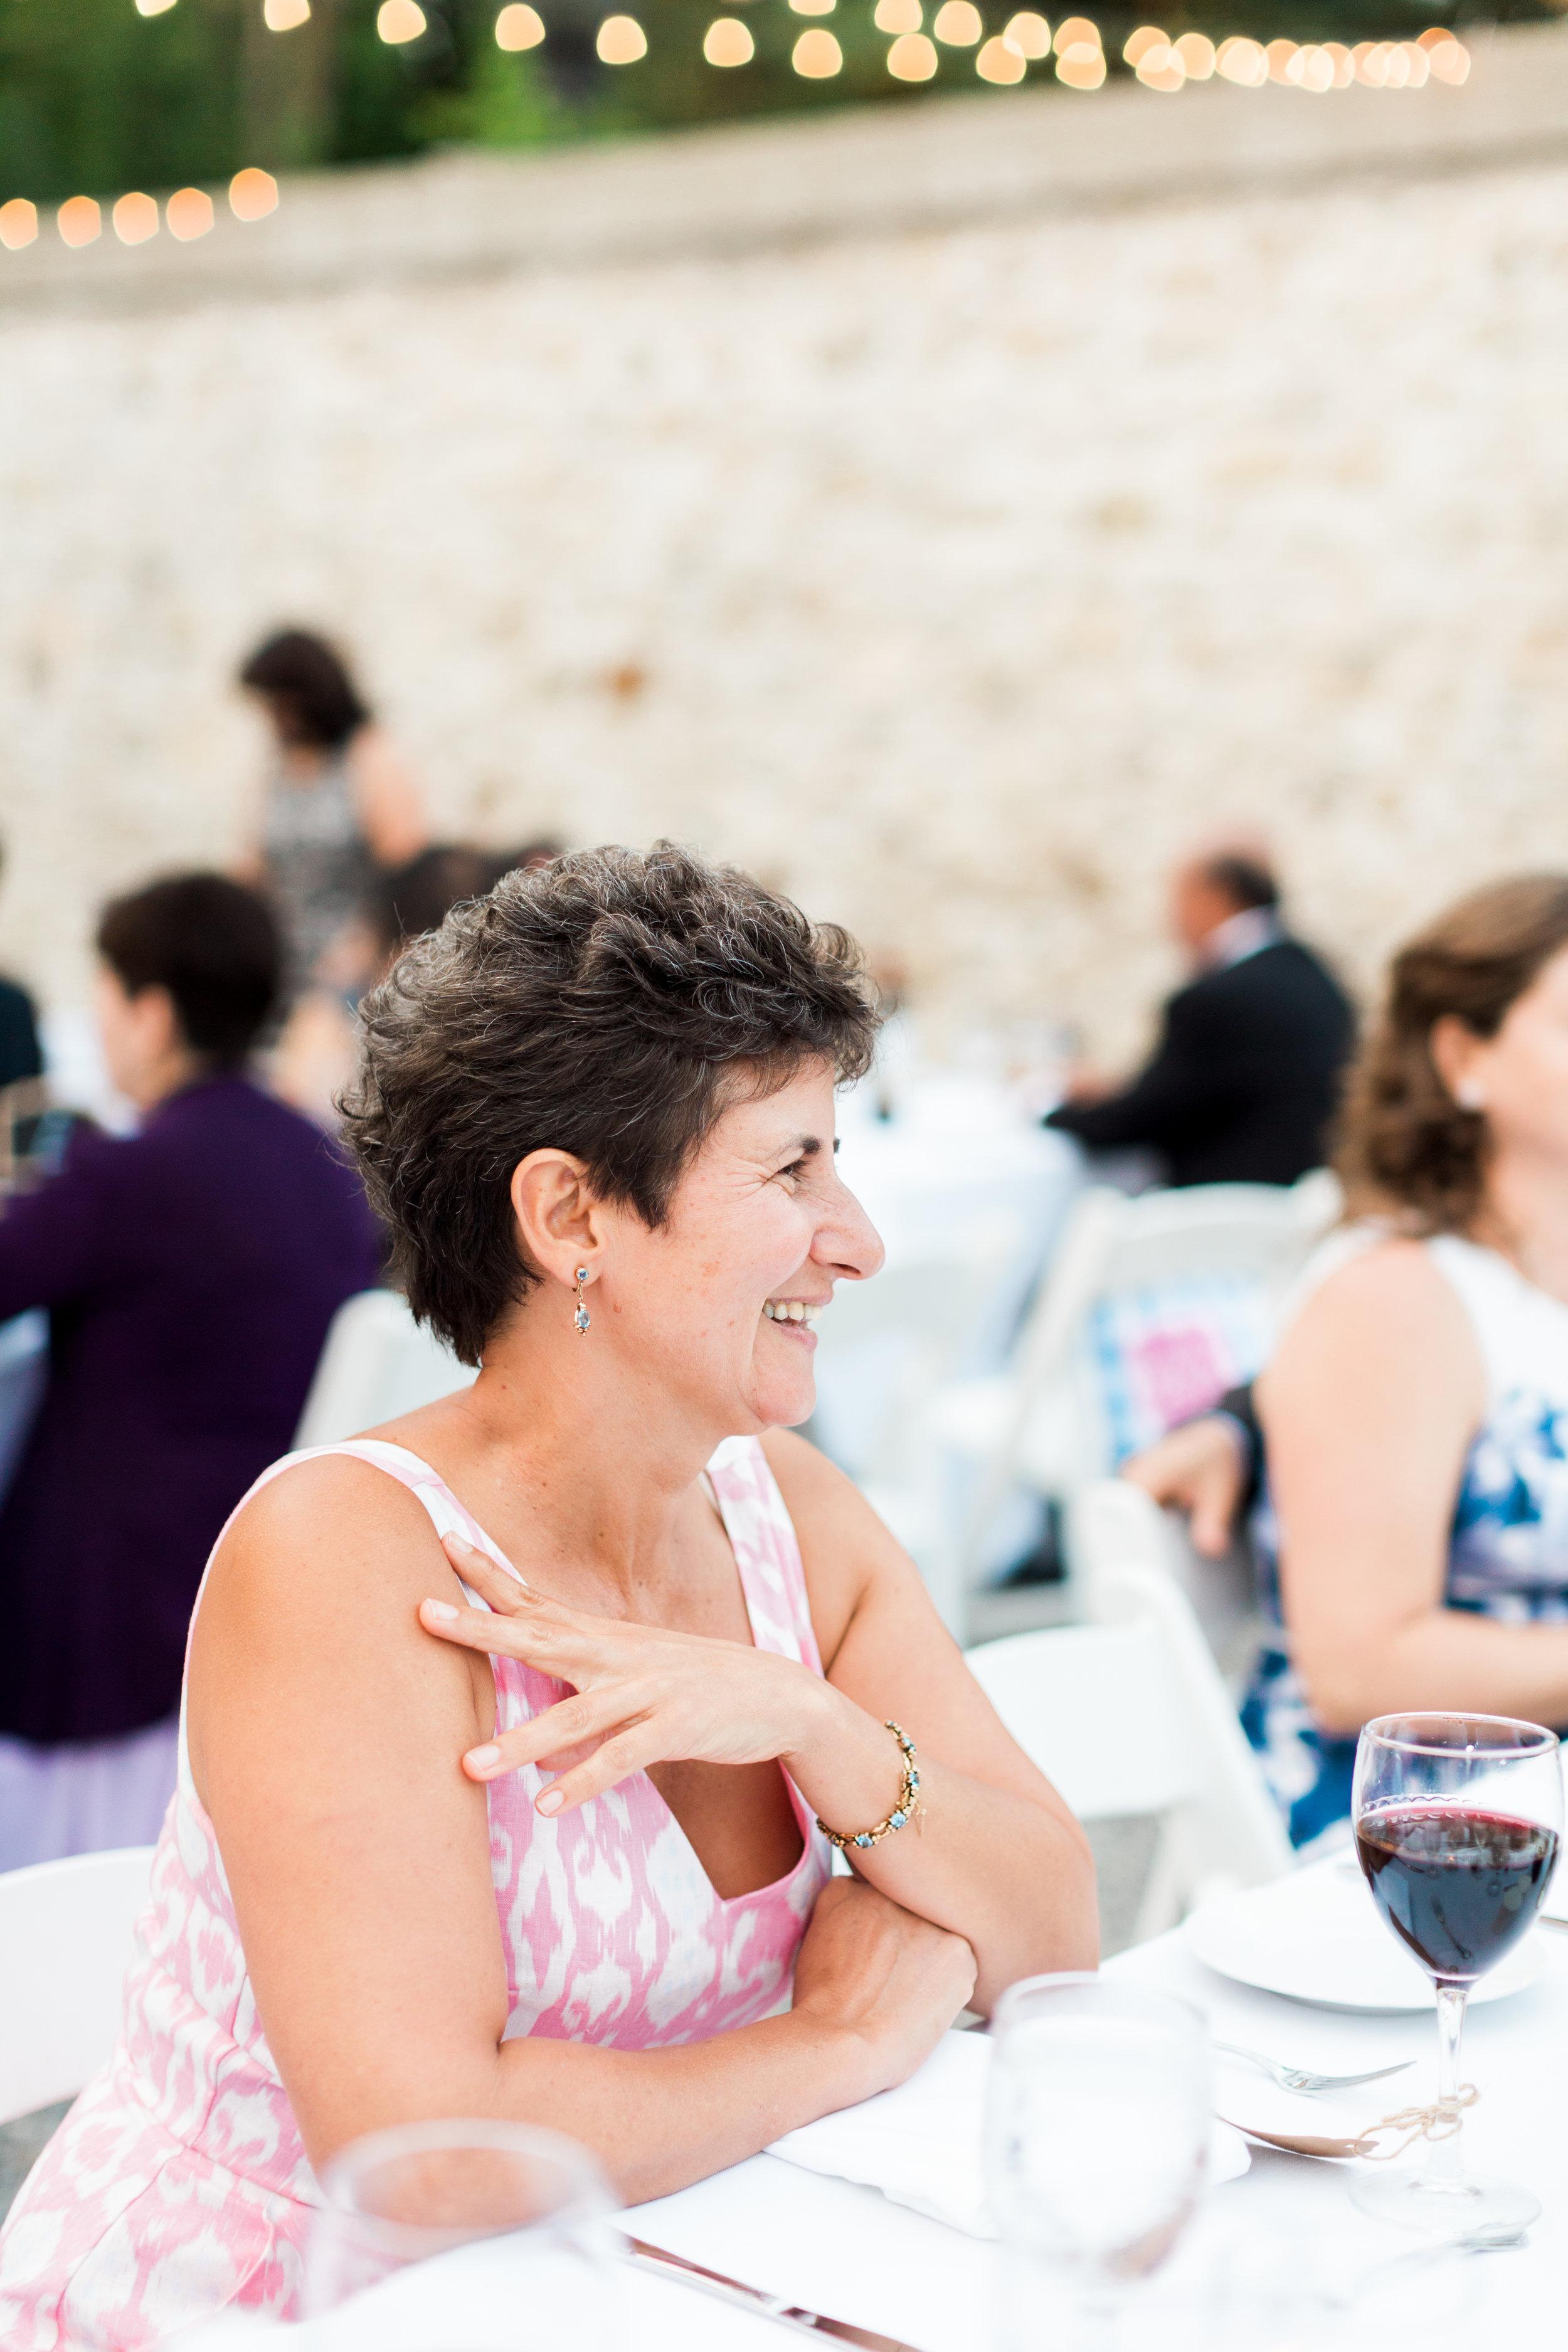 Alton Mills Wedding - Reception-45.jpg